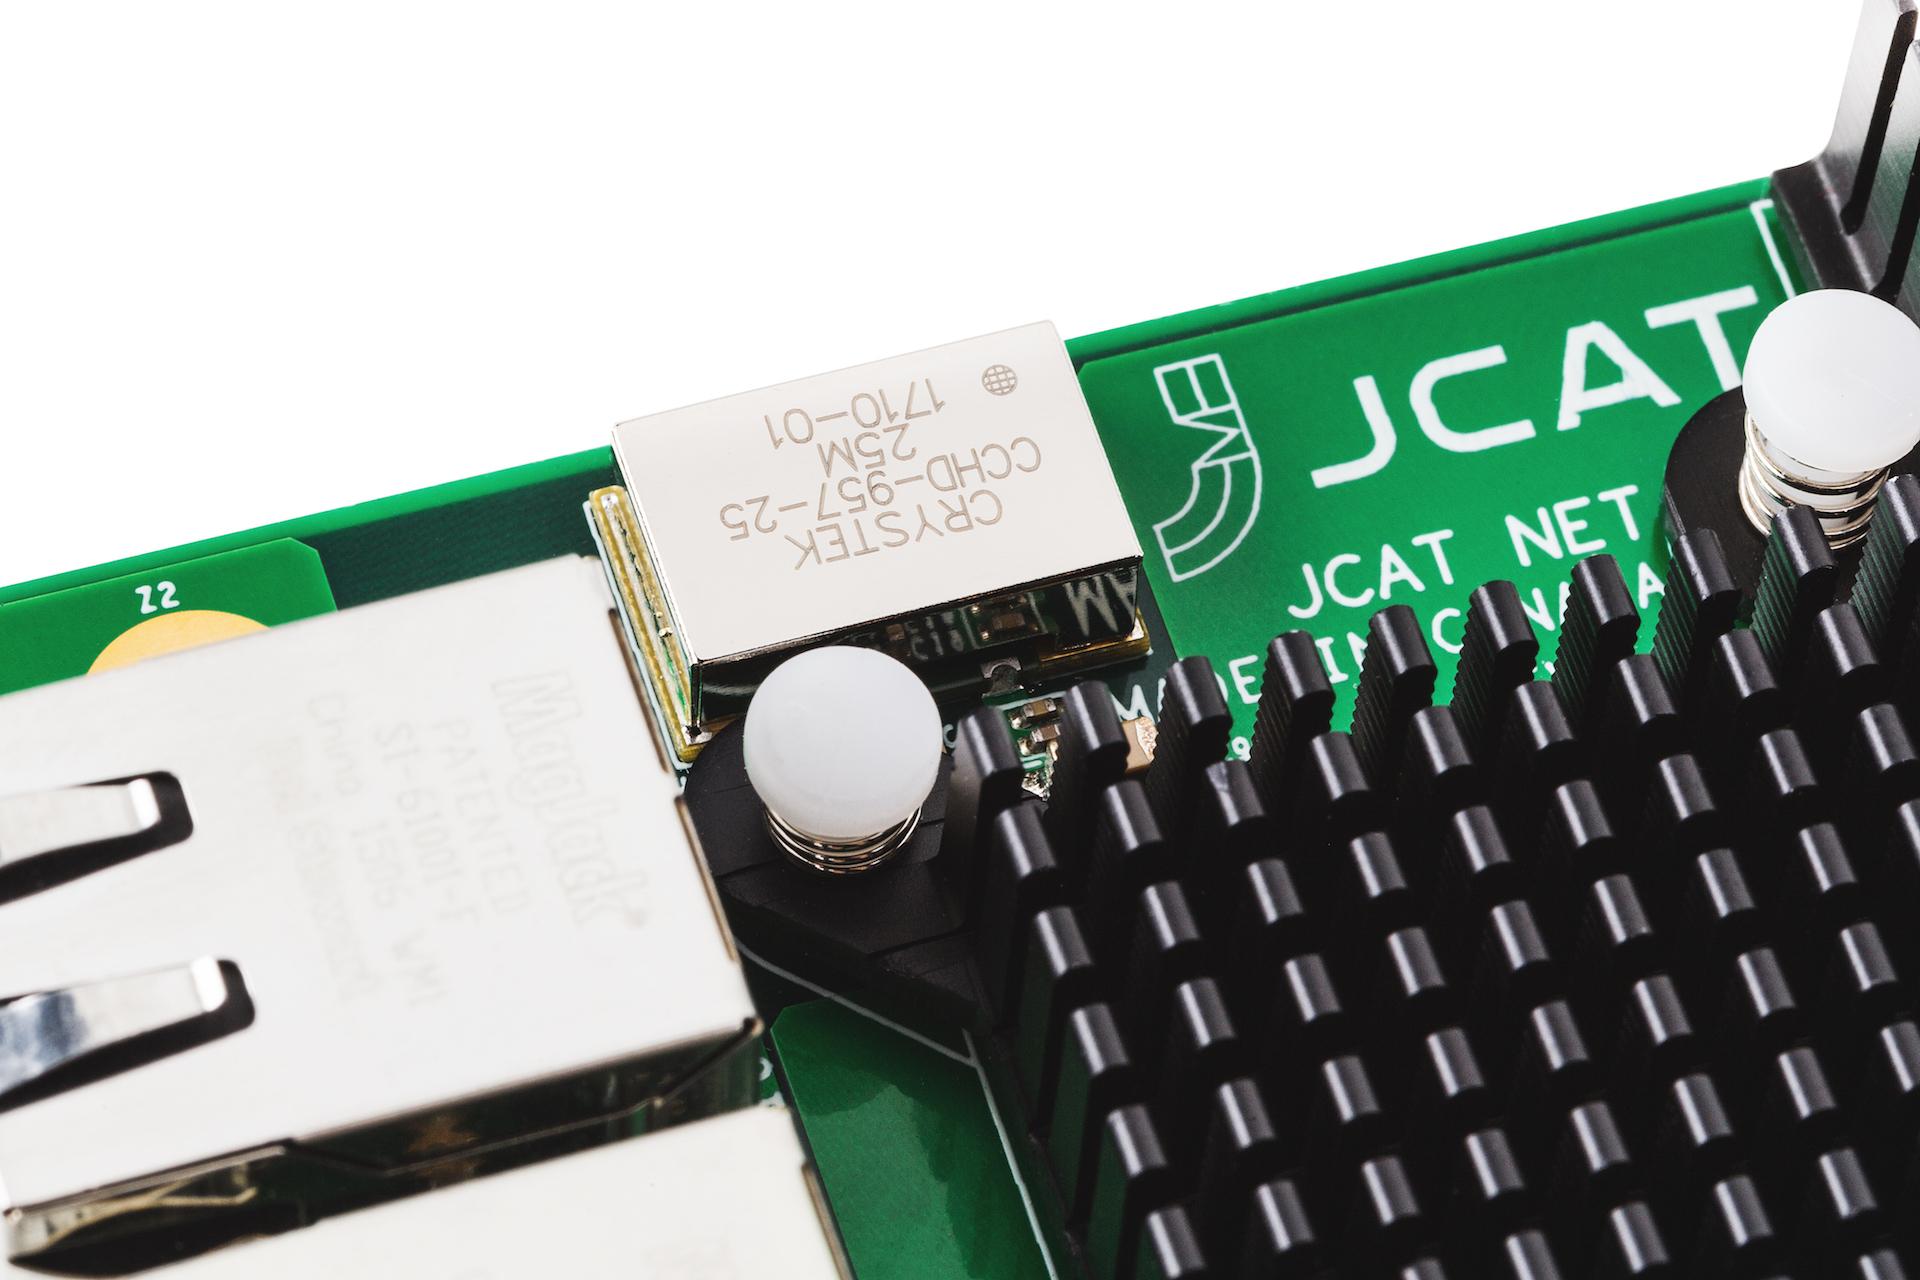 JCAT NET Card FEMTO. Hi-end network controller for music streaming. FEMTO clock